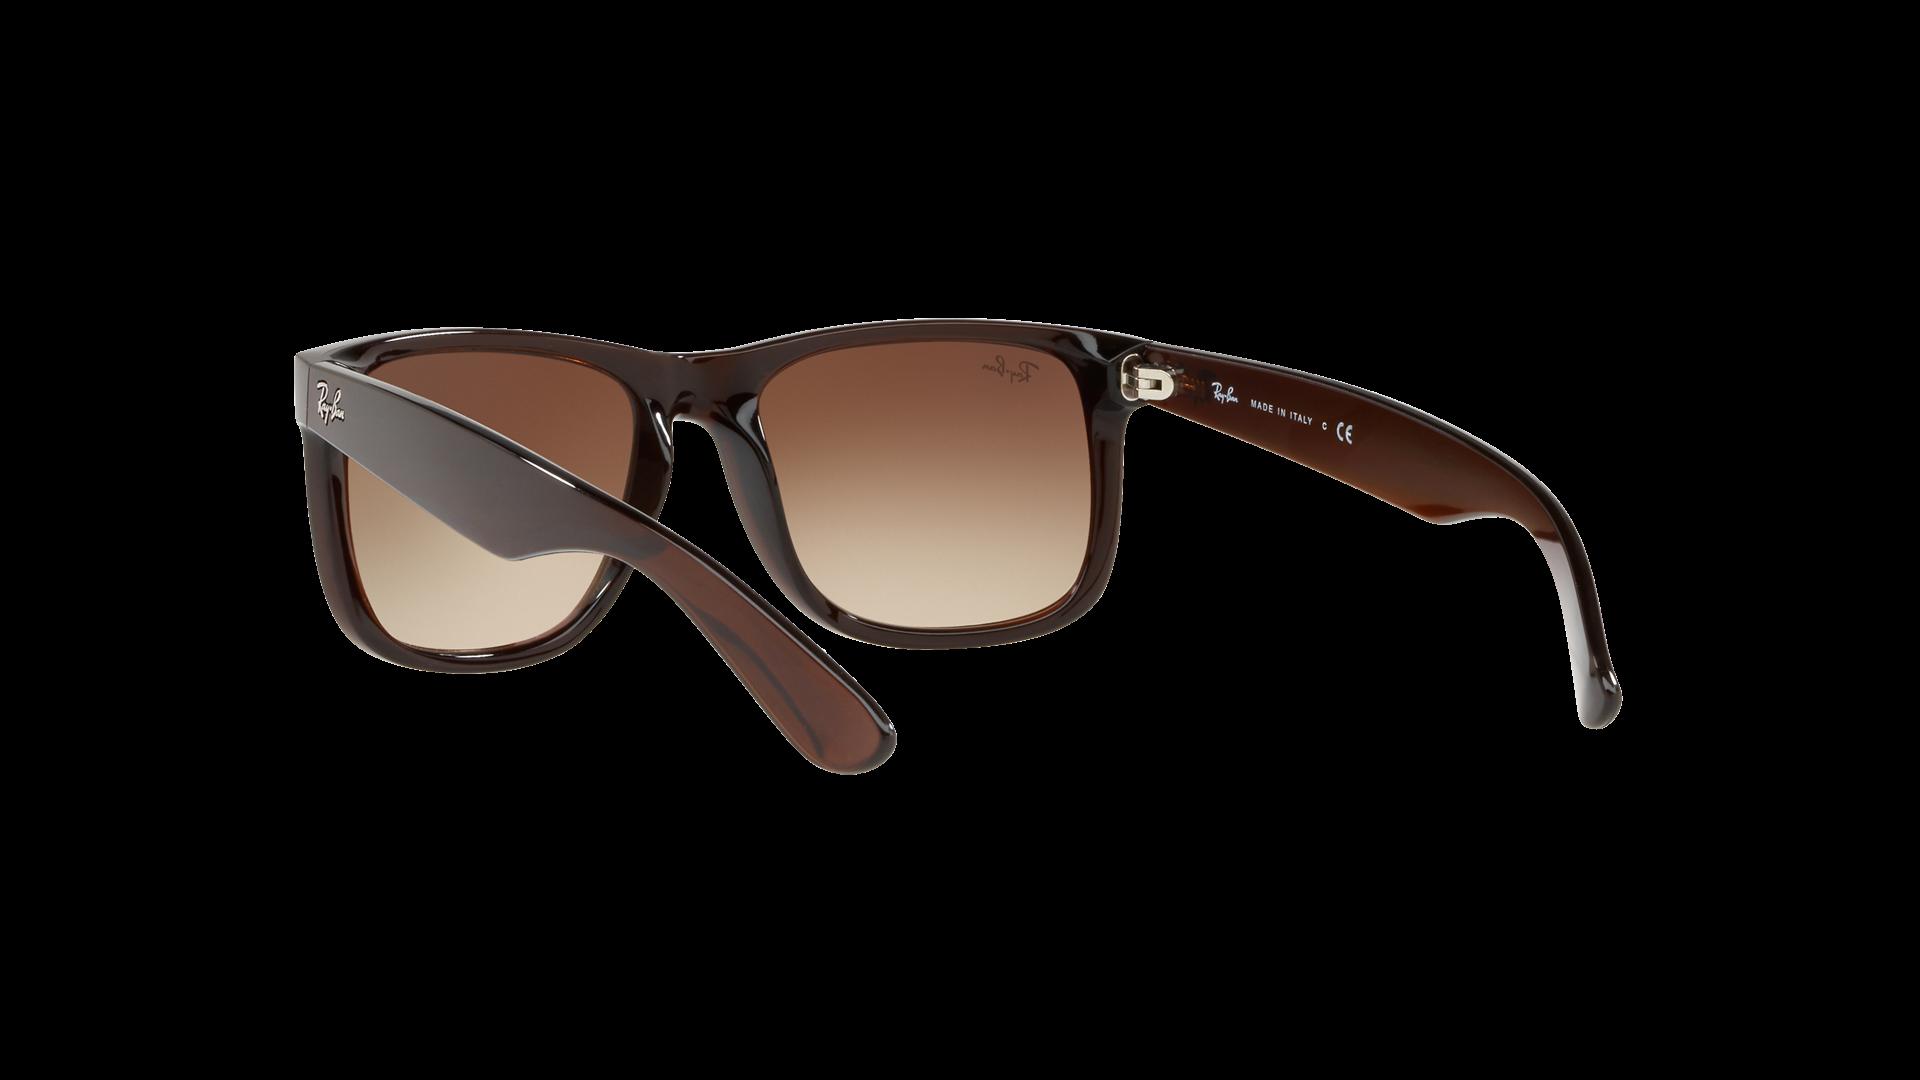 2d0370c9ff Sunglasses Ray-Ban Justin Flash gradient lenses Brown RB4165 714 S0 54-16  Medium Gradient Mirror. Medium. 51-16